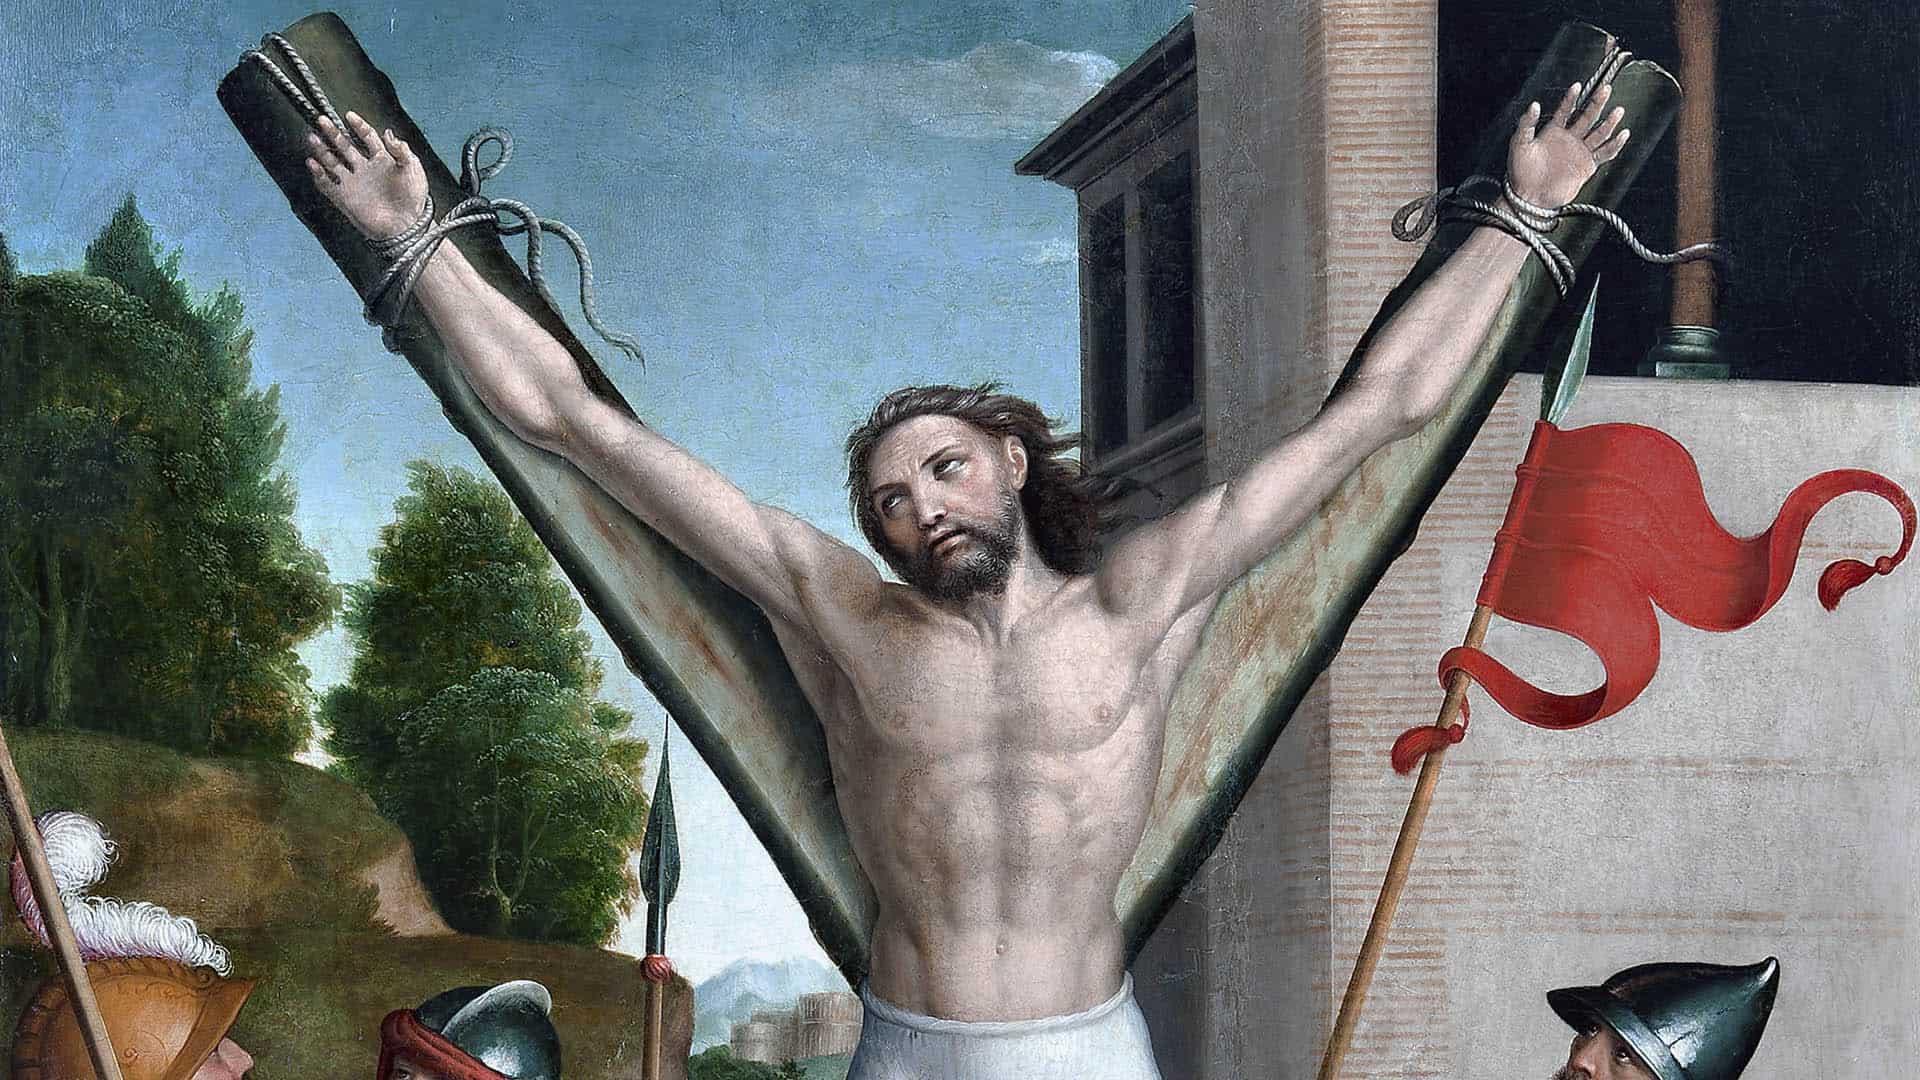 olv-ter-nood-heiloo-heilige-andreas-kruisiging